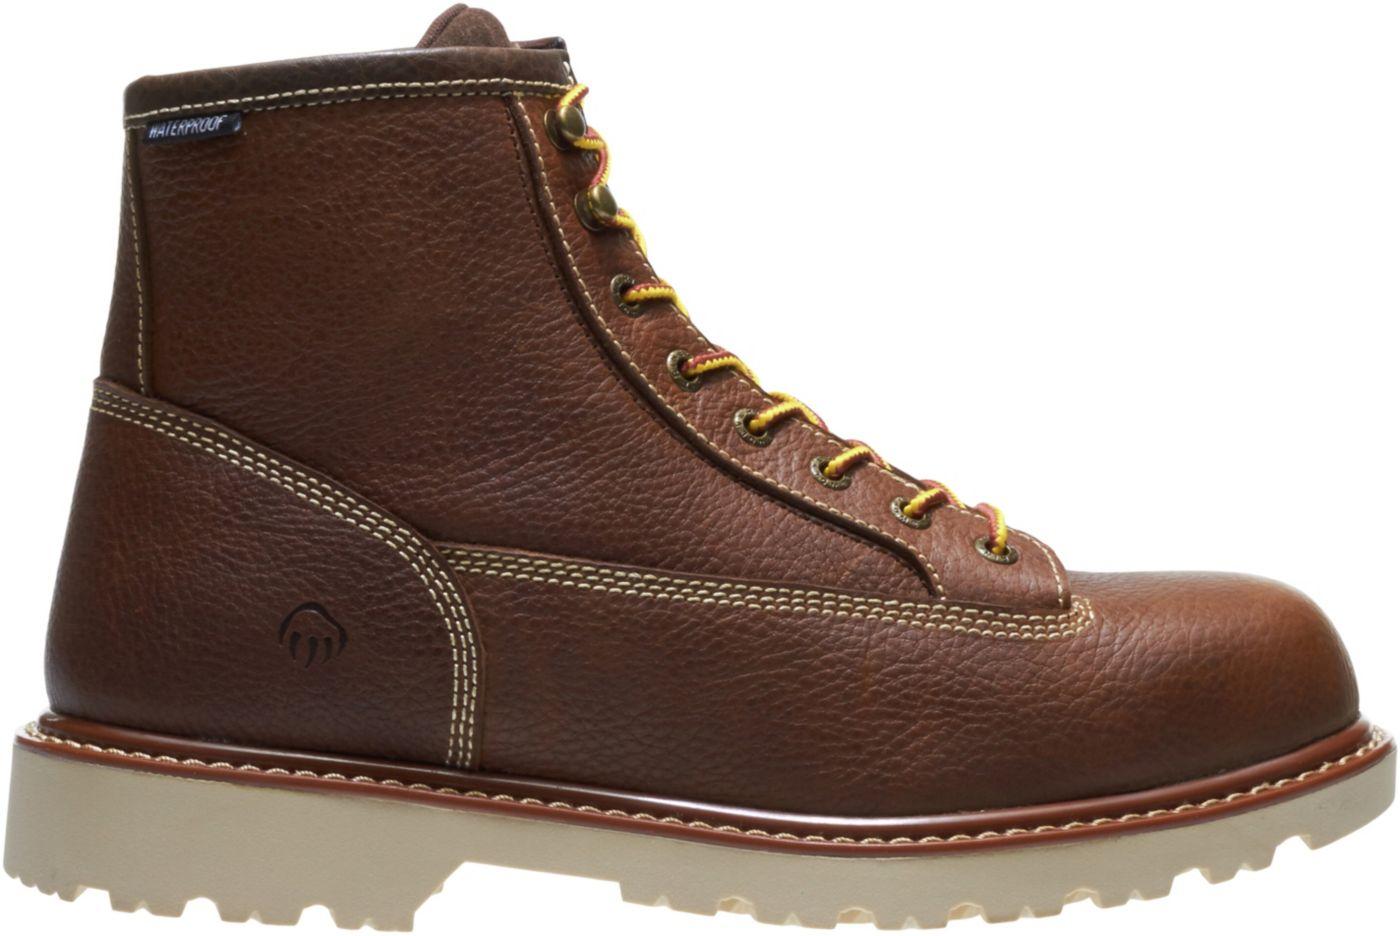 Wolverine Men's Floorhand II Work Boots